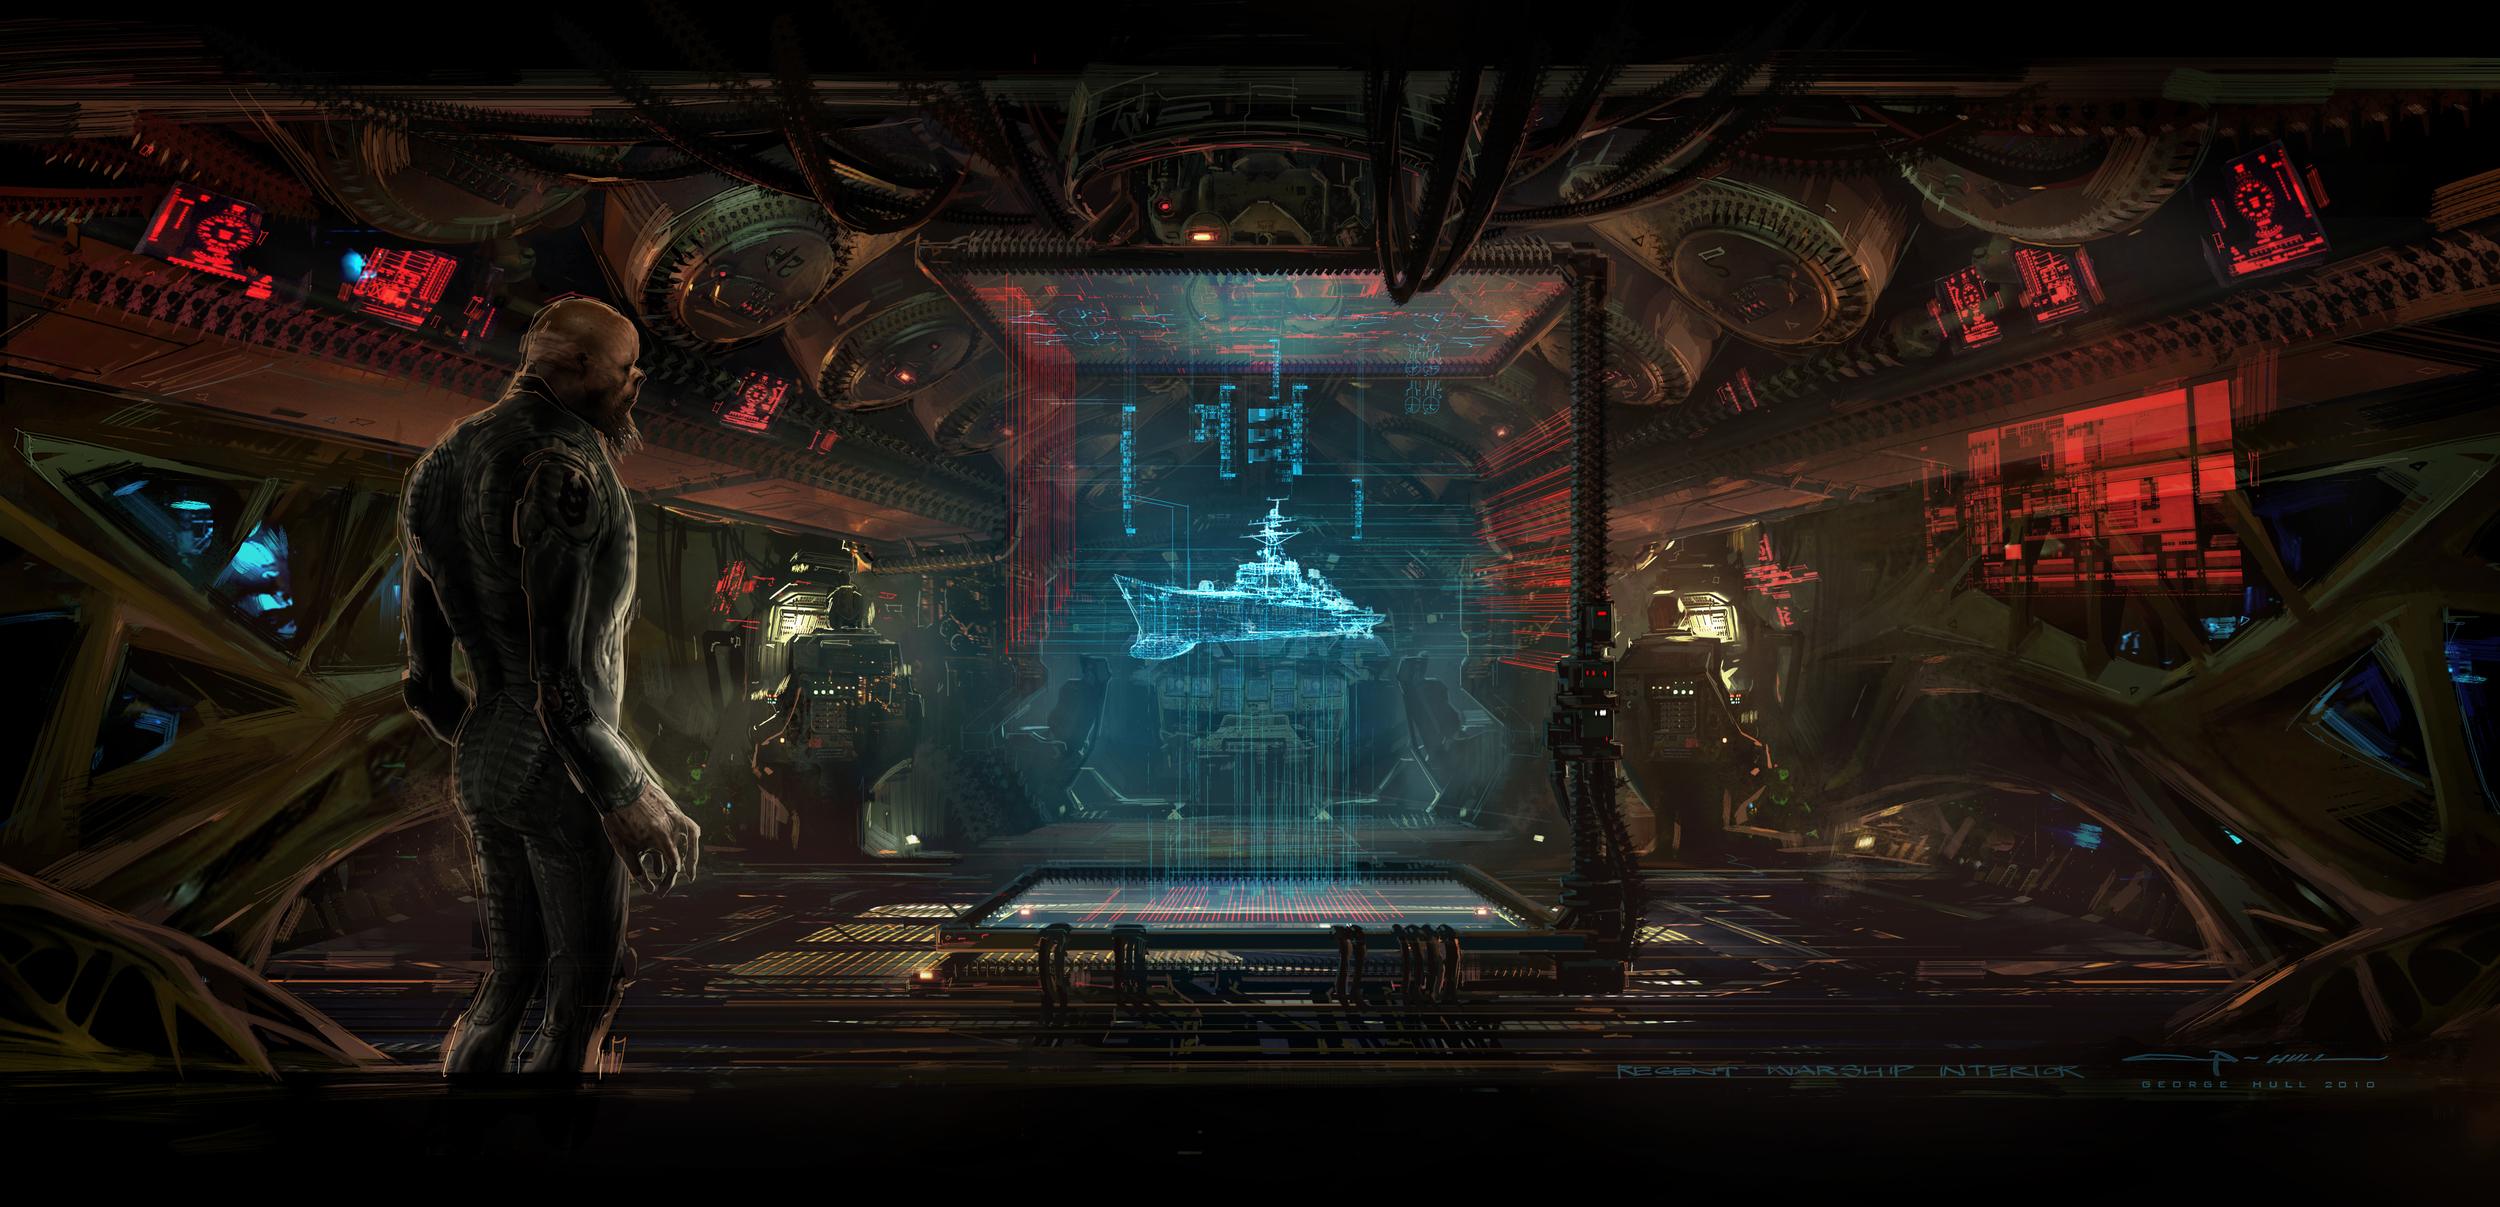 Battleship6_VehInt_WarRoomHoloGreen_gh.jpg